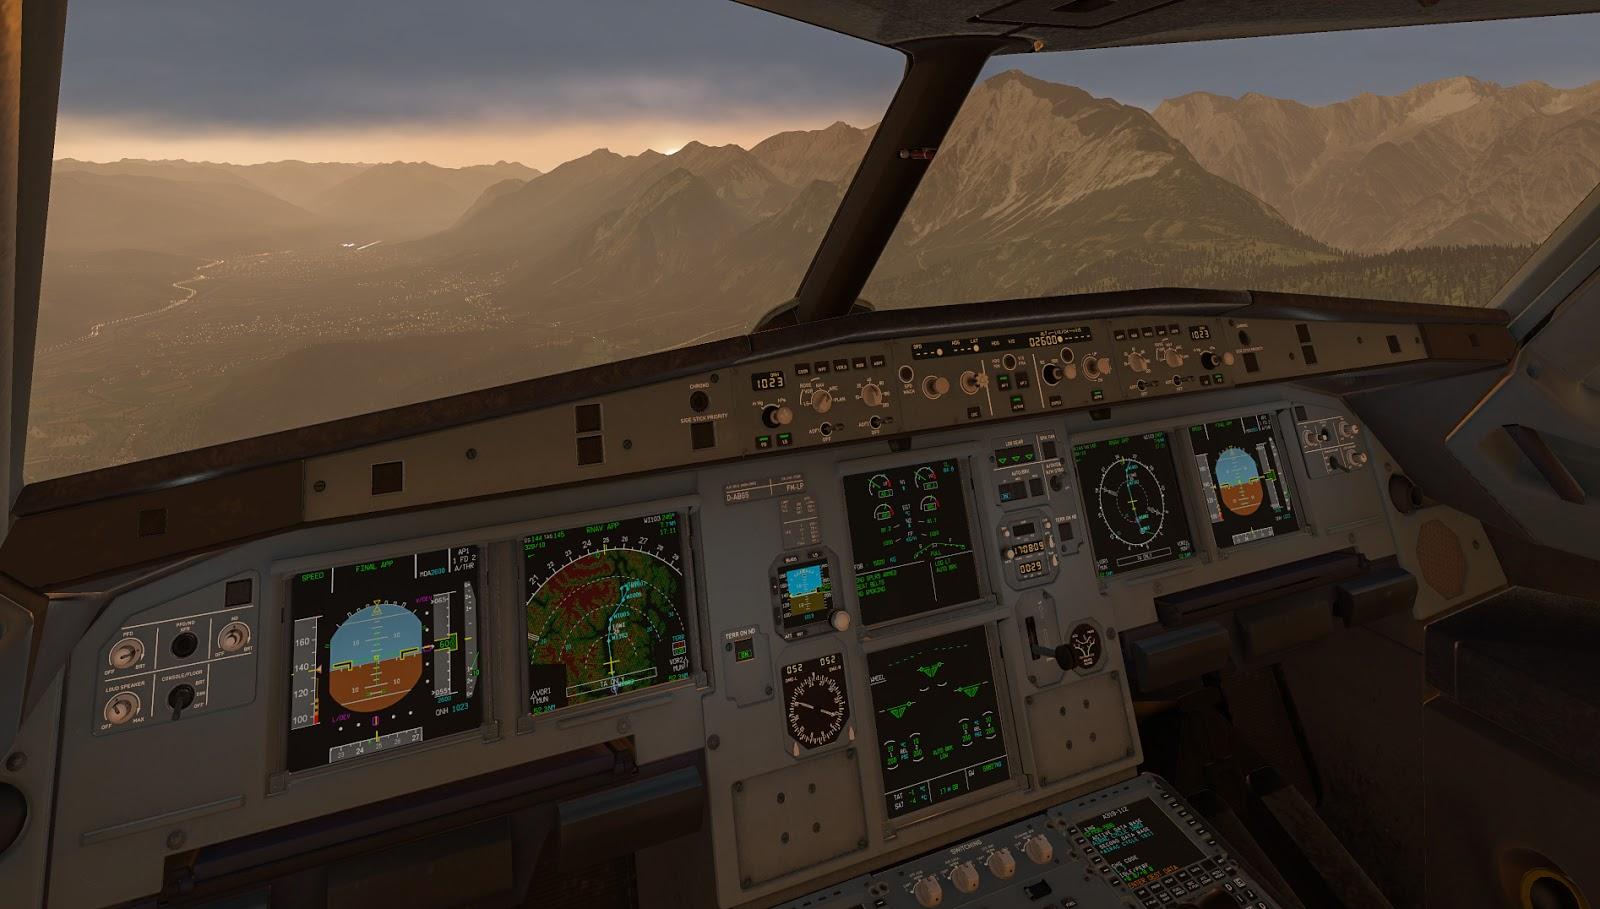 Flight Log - Toliss A319 - EDDM - LOWI - EDDM